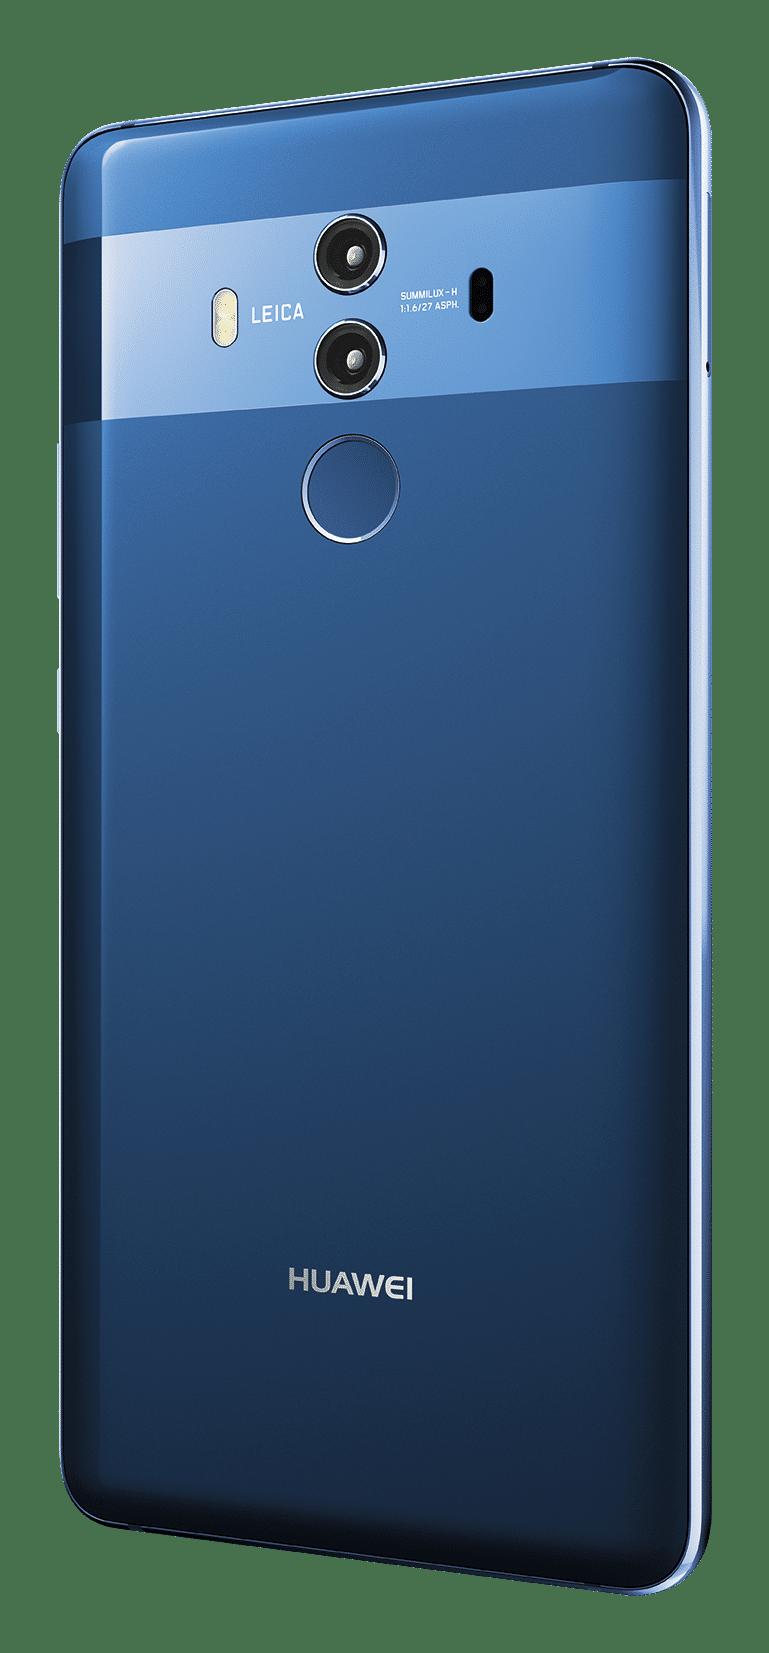 huawei mate 10 pro huawei stellt neues smartphone mit ki prozessor vor. Black Bedroom Furniture Sets. Home Design Ideas